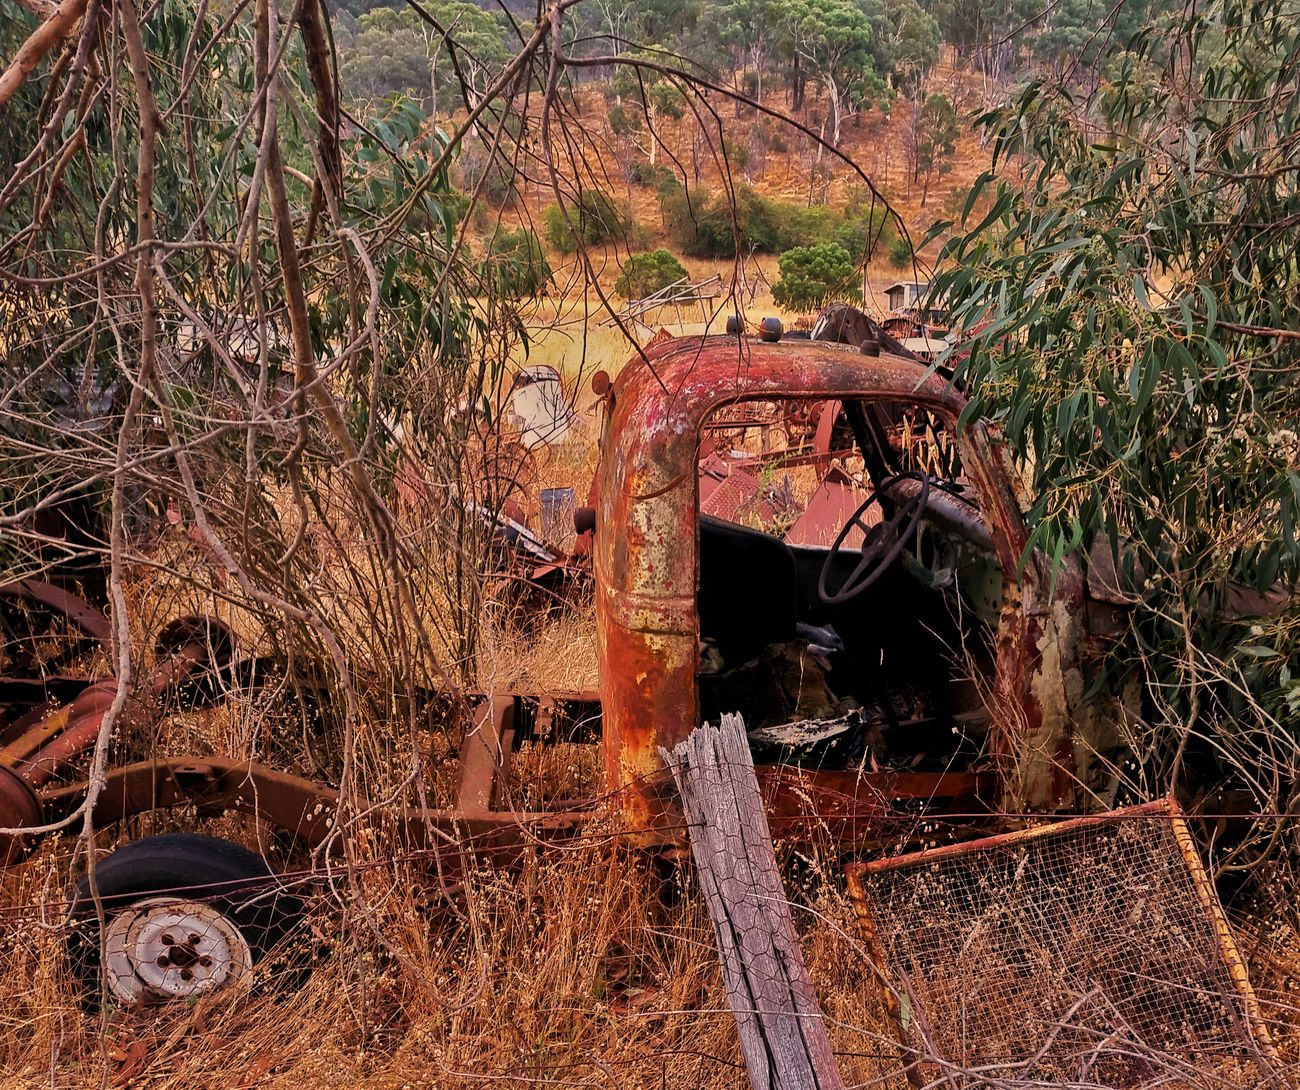 ' Rust In Peace' Rust RustyLicious Rustygoodness Rusty Metal Rusty Autos Scrap Heap Australia Eye4photography  EyeEm Masterclass Landscape_Collection Mobilephotography Exceptional Photographs Australian Landscape EyeEm Best Shots Beauty In Nature